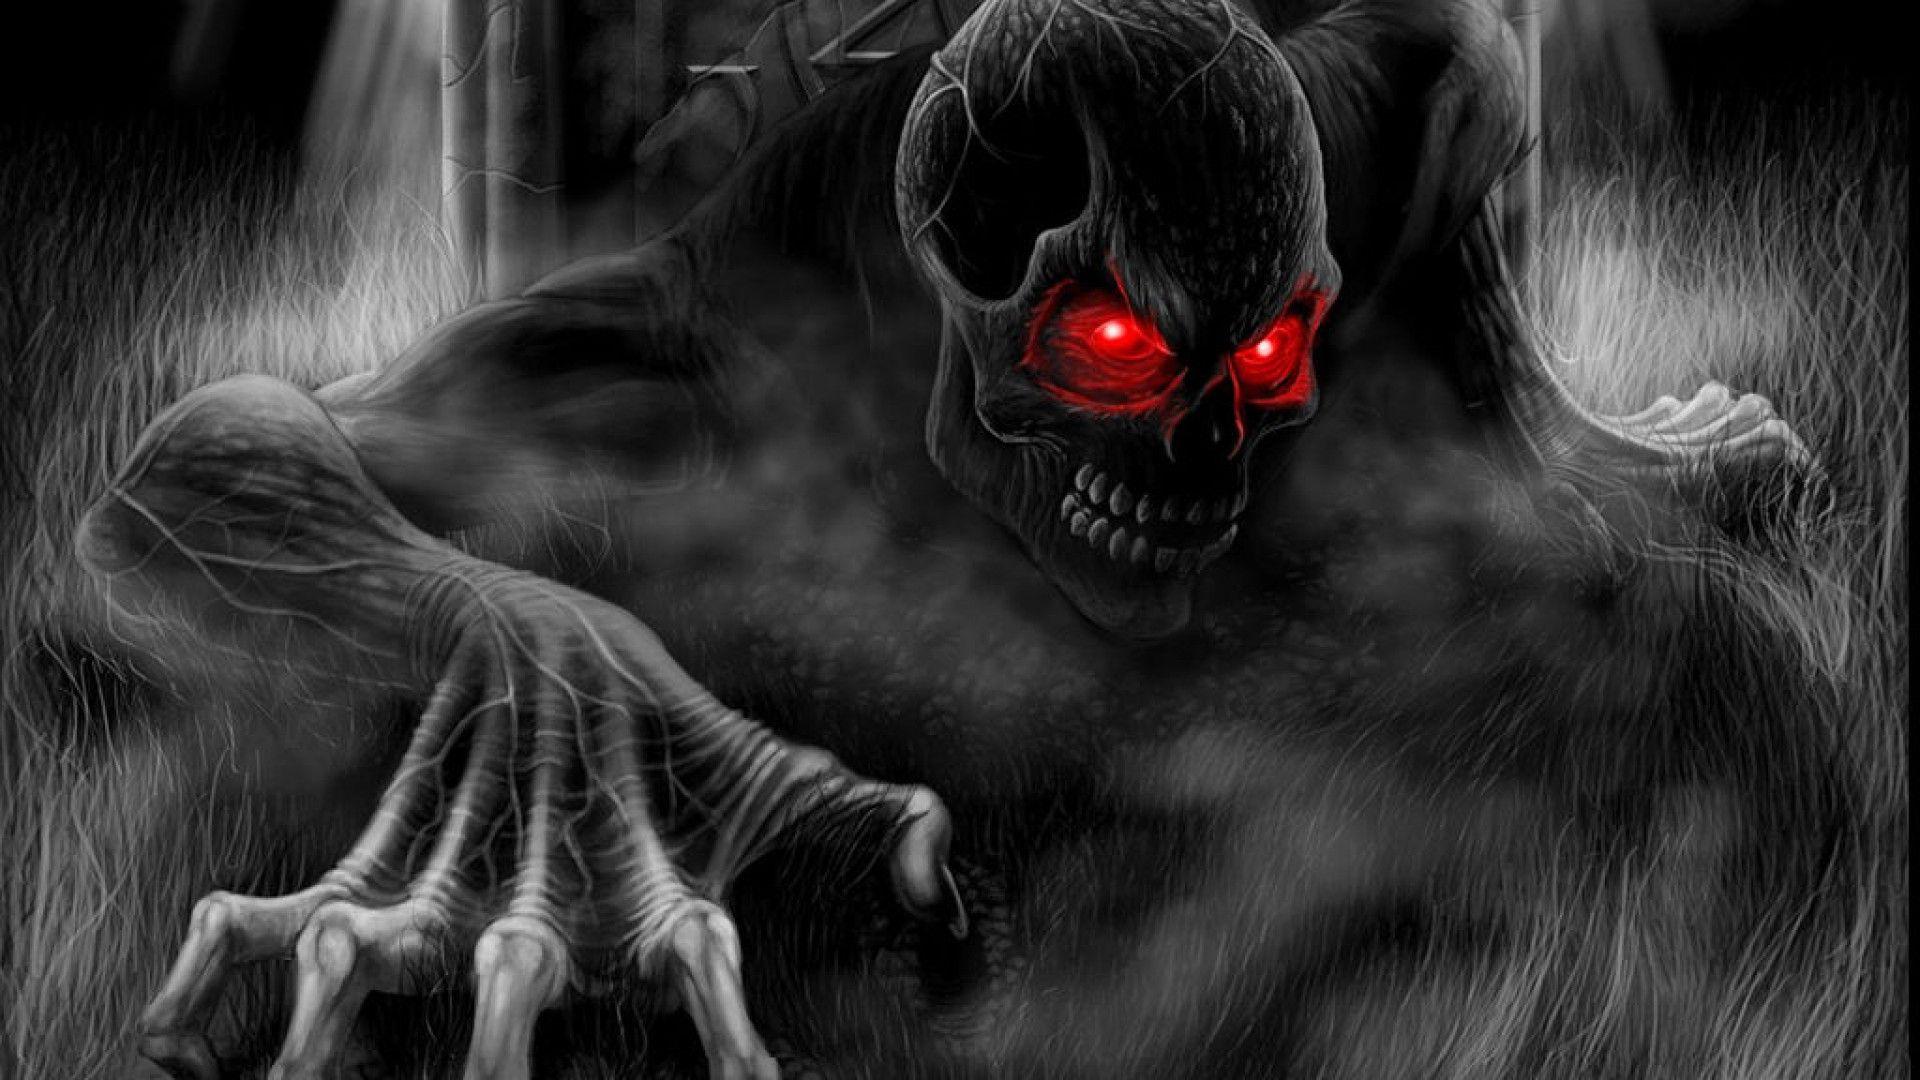 Great Wallpaper Halloween Unique - 65ba2146c896b00bf4be8224ebc7c219  Best Photo Reference_351354.jpg